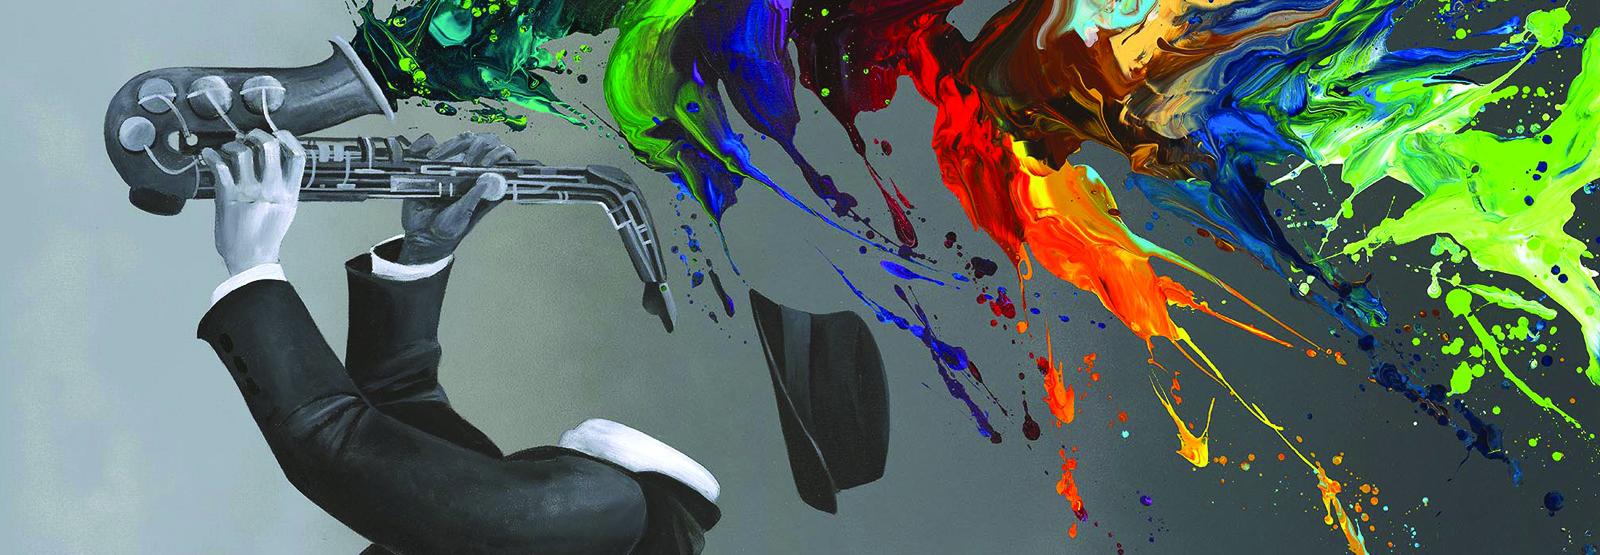 artist-bio-banners_kre8 - Park West Gallery